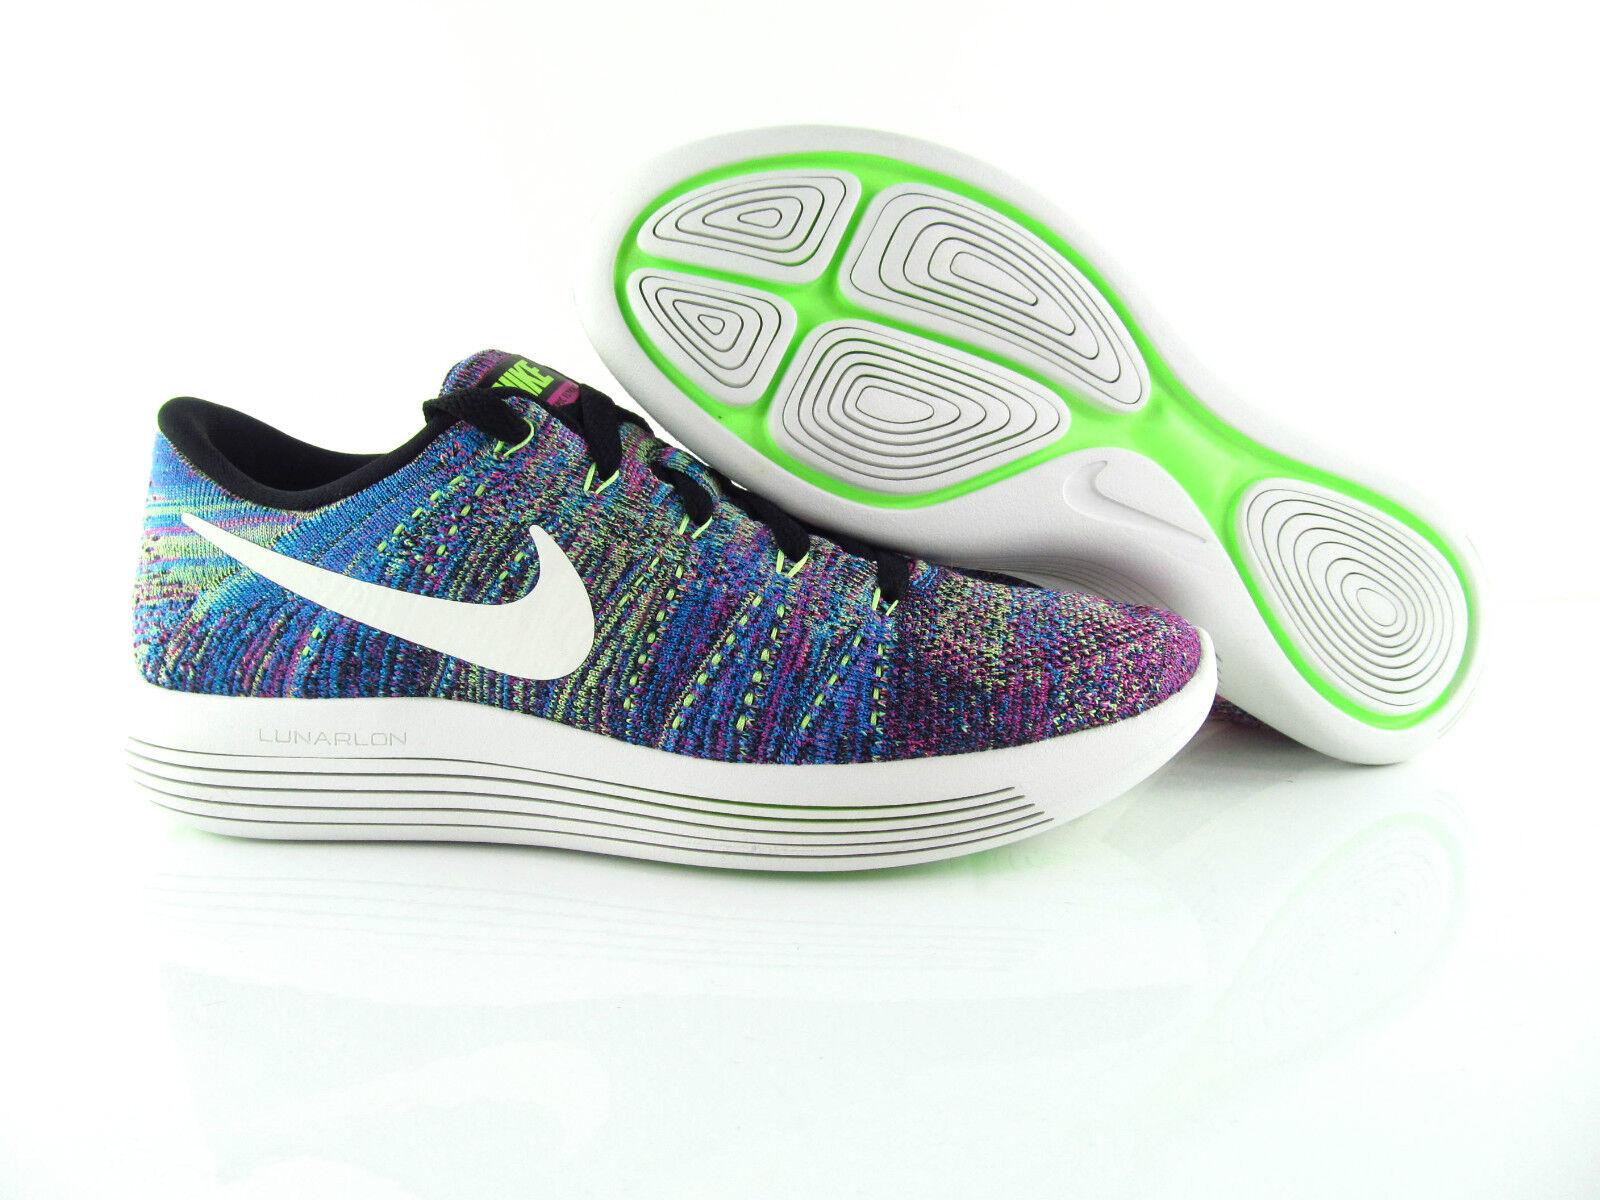 Nike Lunarepic Low Flyknit Multicolor Running US_6.5 UK_4 Eur_ 37.5